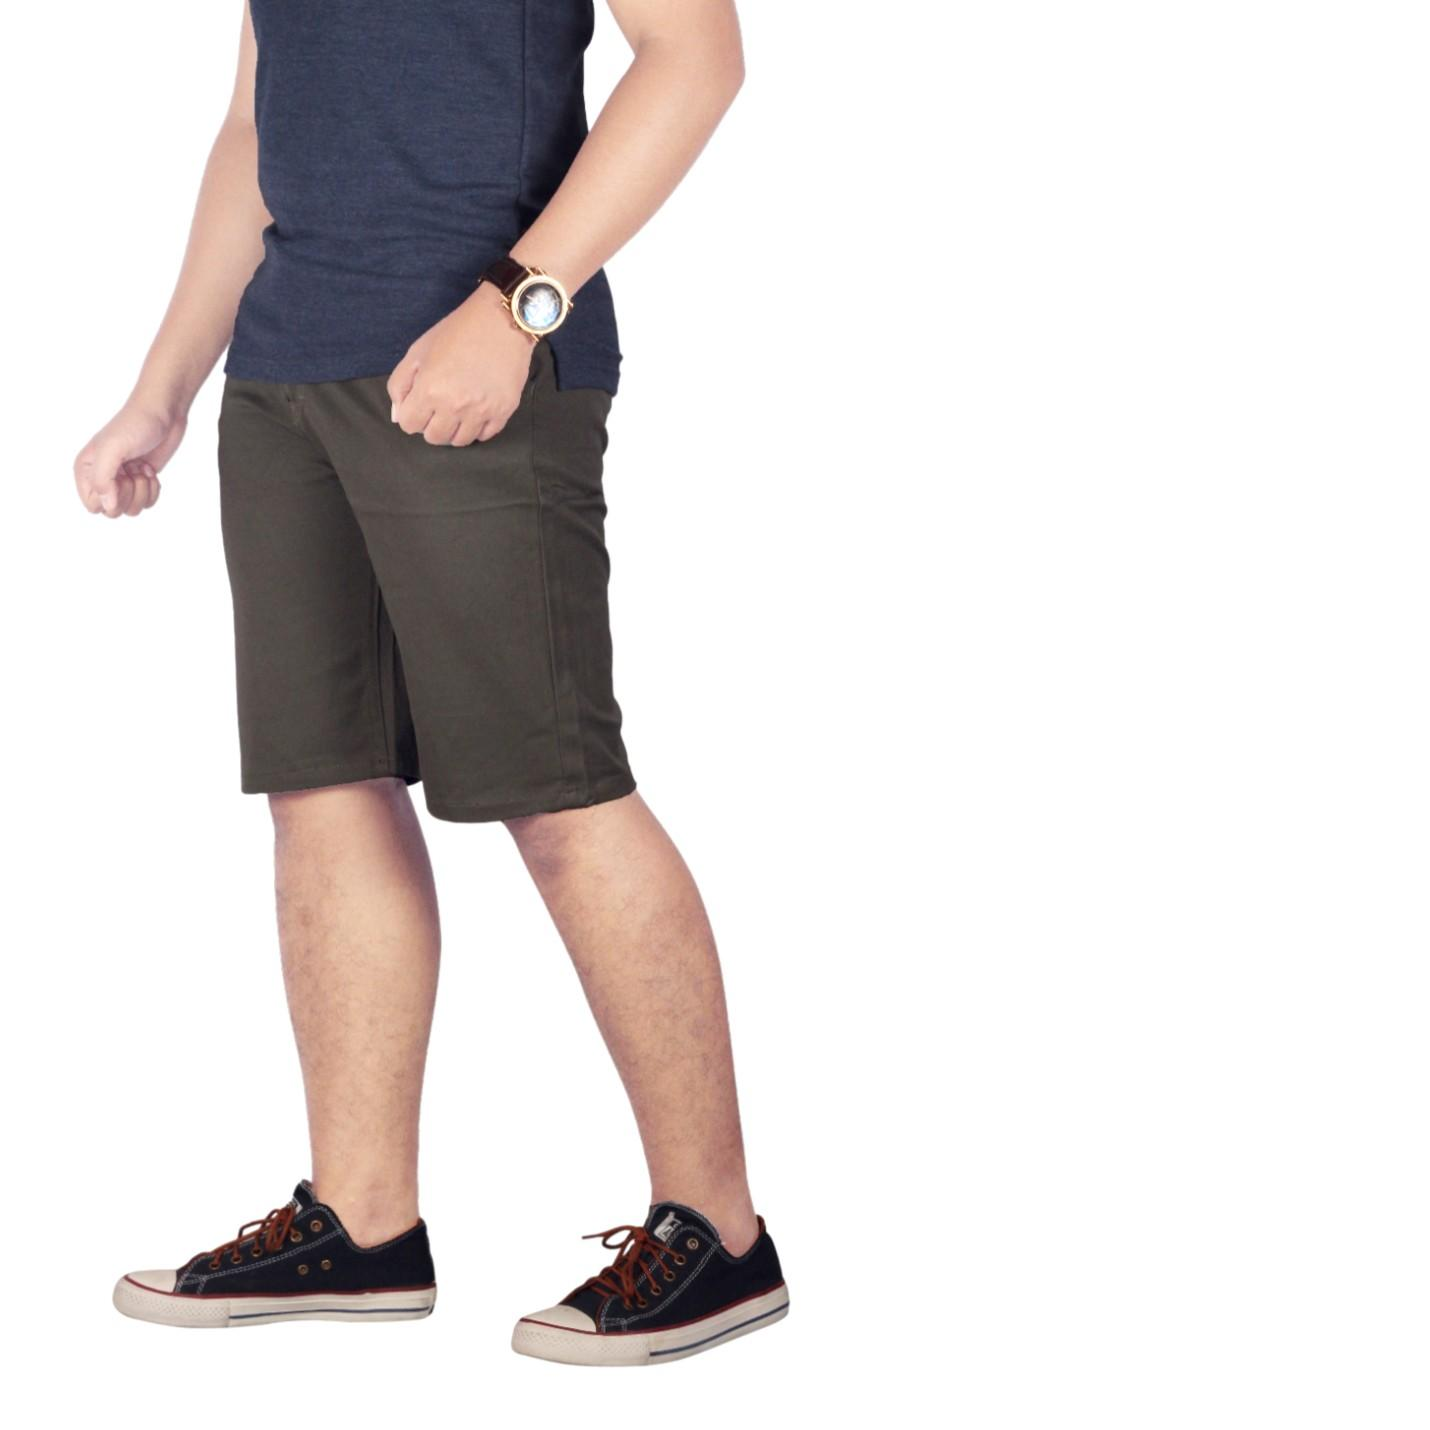 Dgm_Fashion1 Celana Pendek Distro Polos Import/ Celana Skinny/Celana Pants/Celana Santai/Celana Casual/Celana Motif/Celana Polos/Celana Pria/Celana Cino/Celana Pantai/Celana Denim/Celana Jeans GA 5539